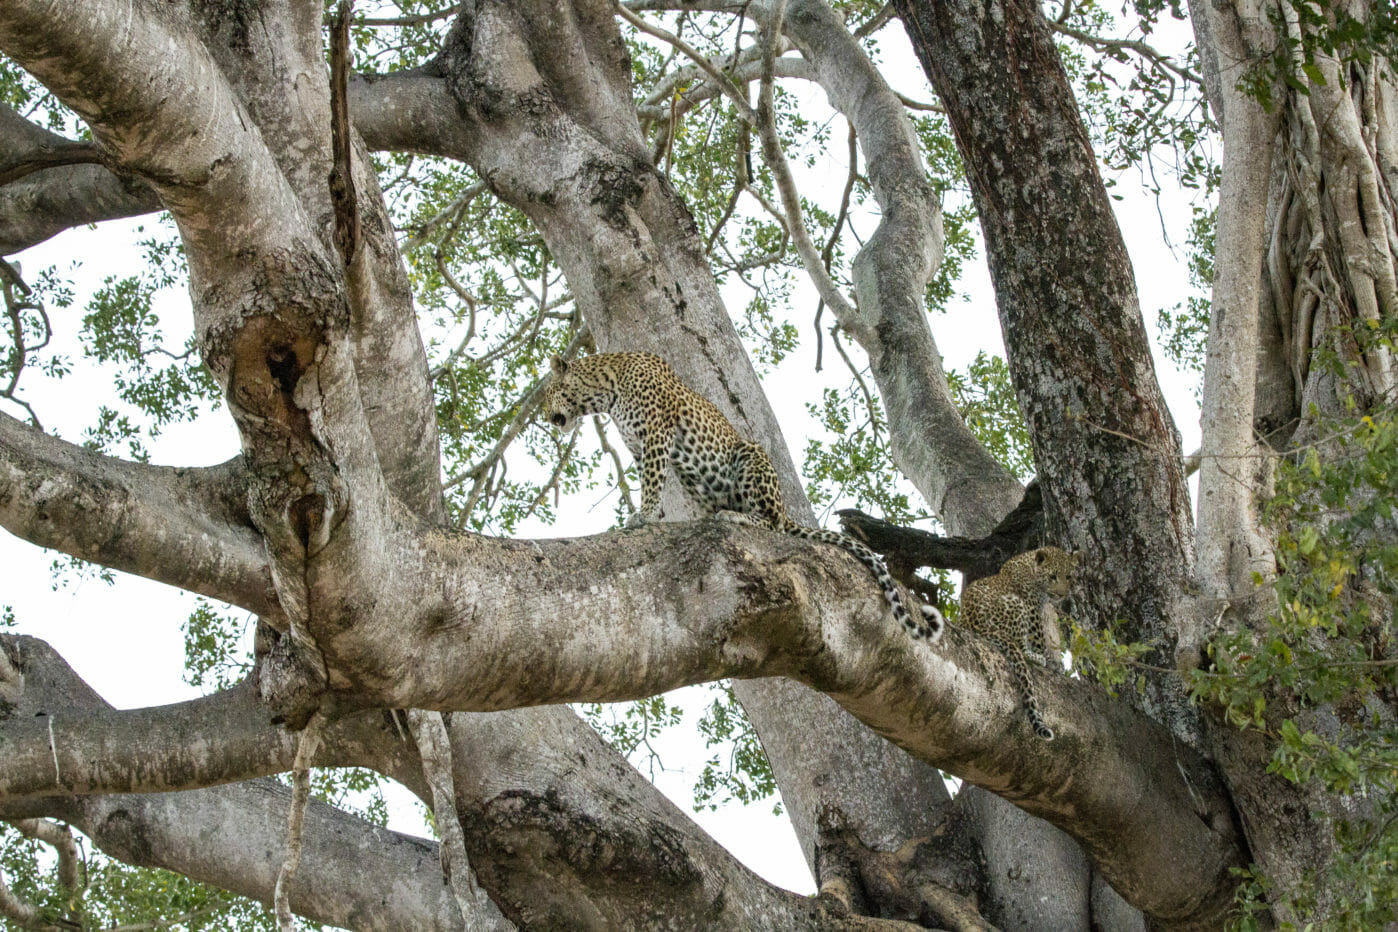 Little Bush Leopard Cub Sycamore Fig Jt